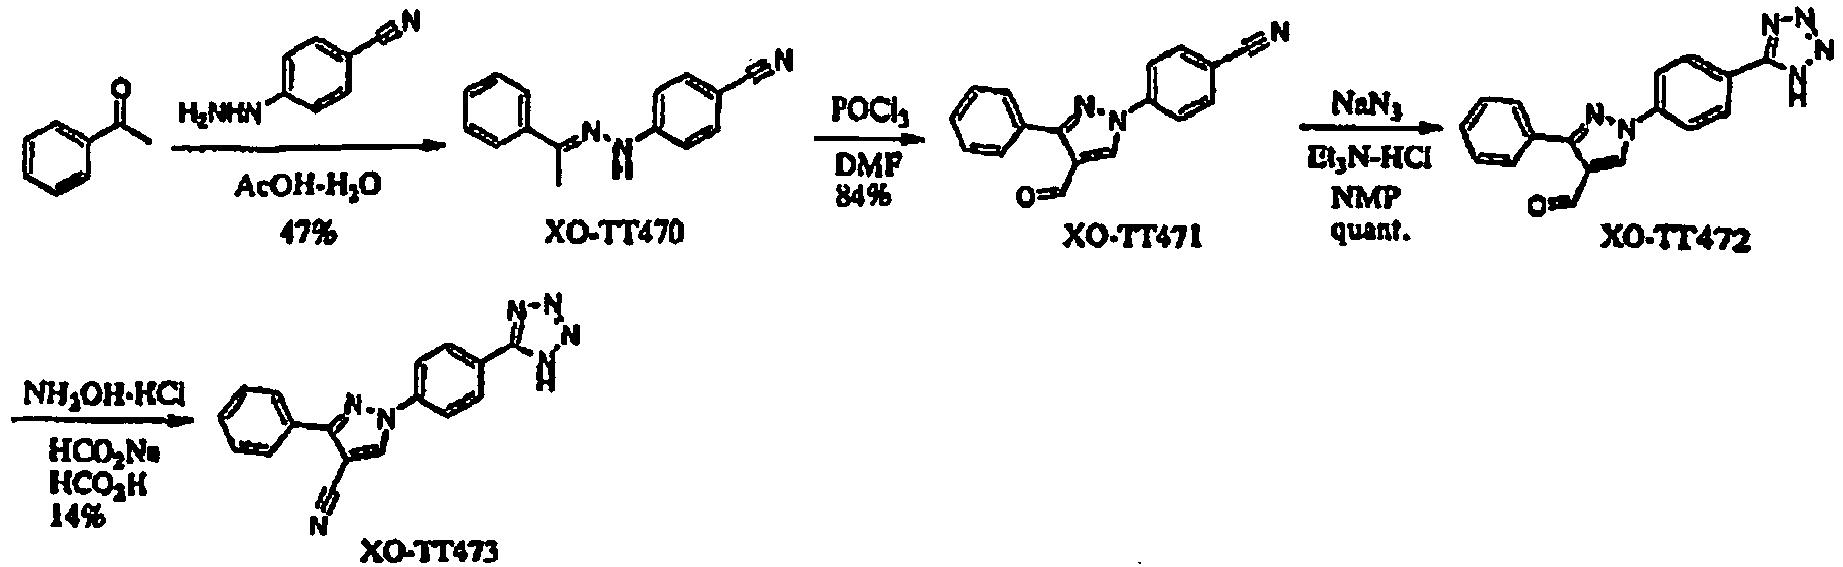 plavix and proton pump inhibitors